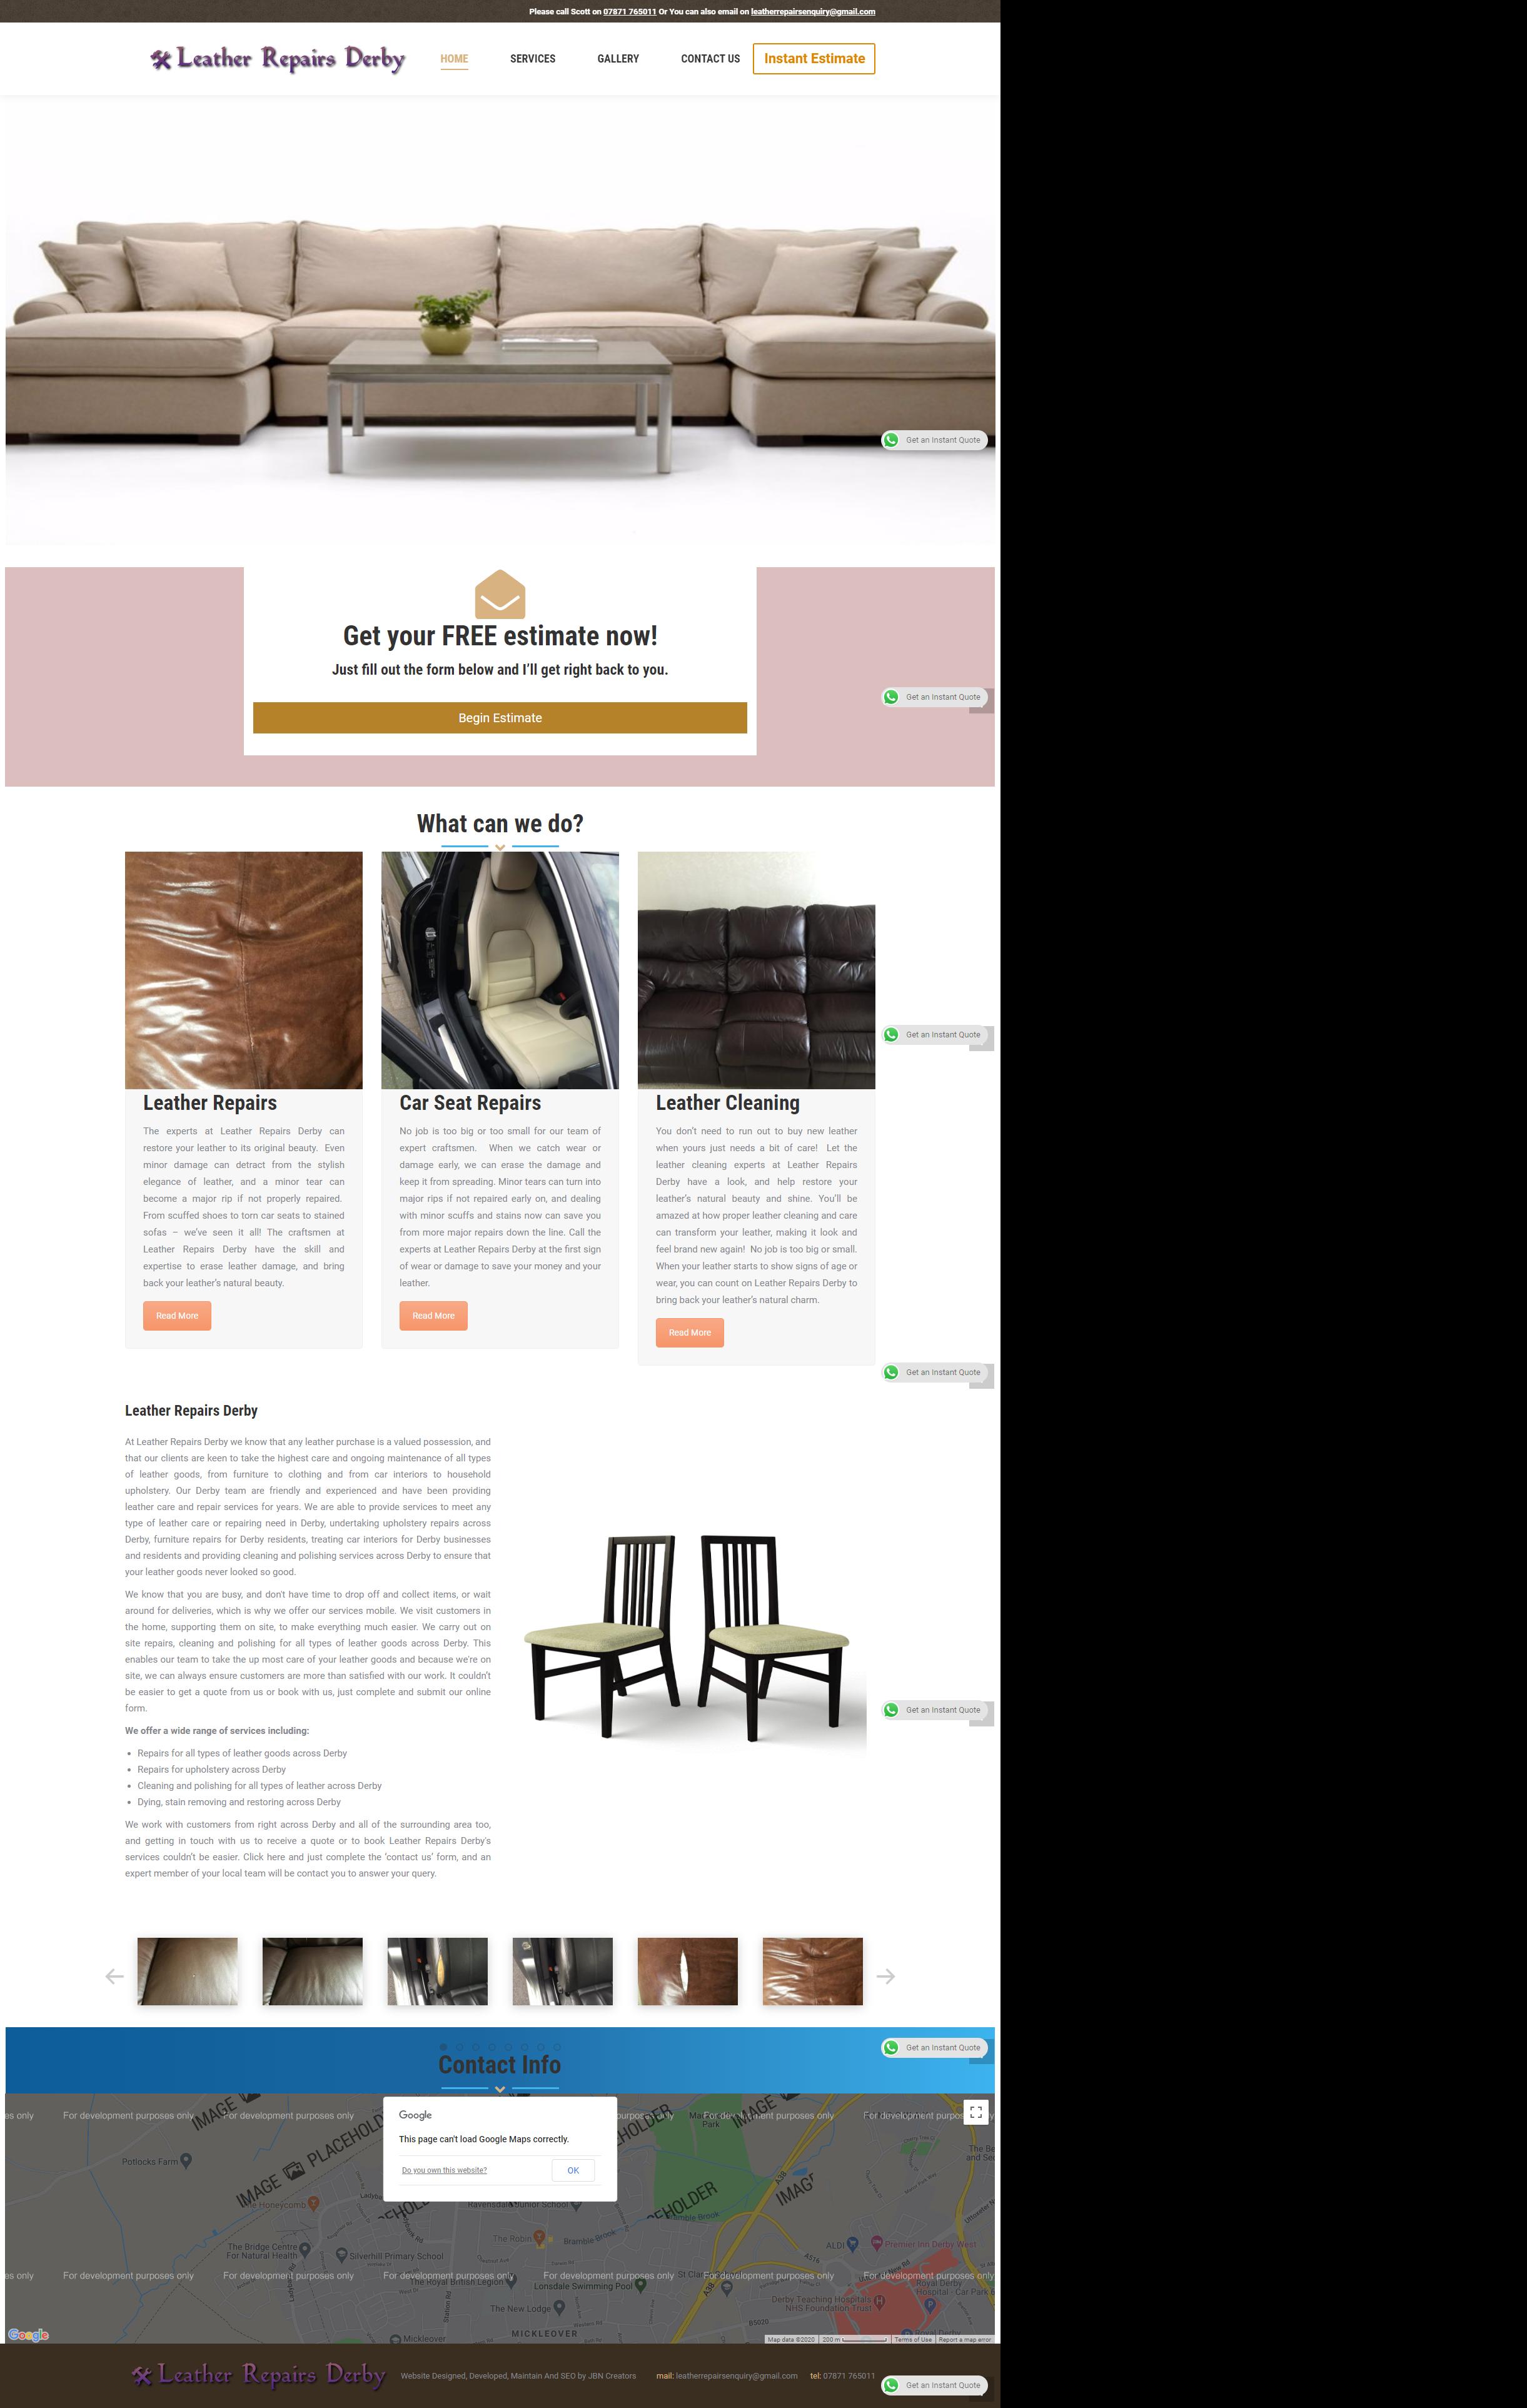 screencapture-www-leatherrepairsderby-co-uk-1594800103624